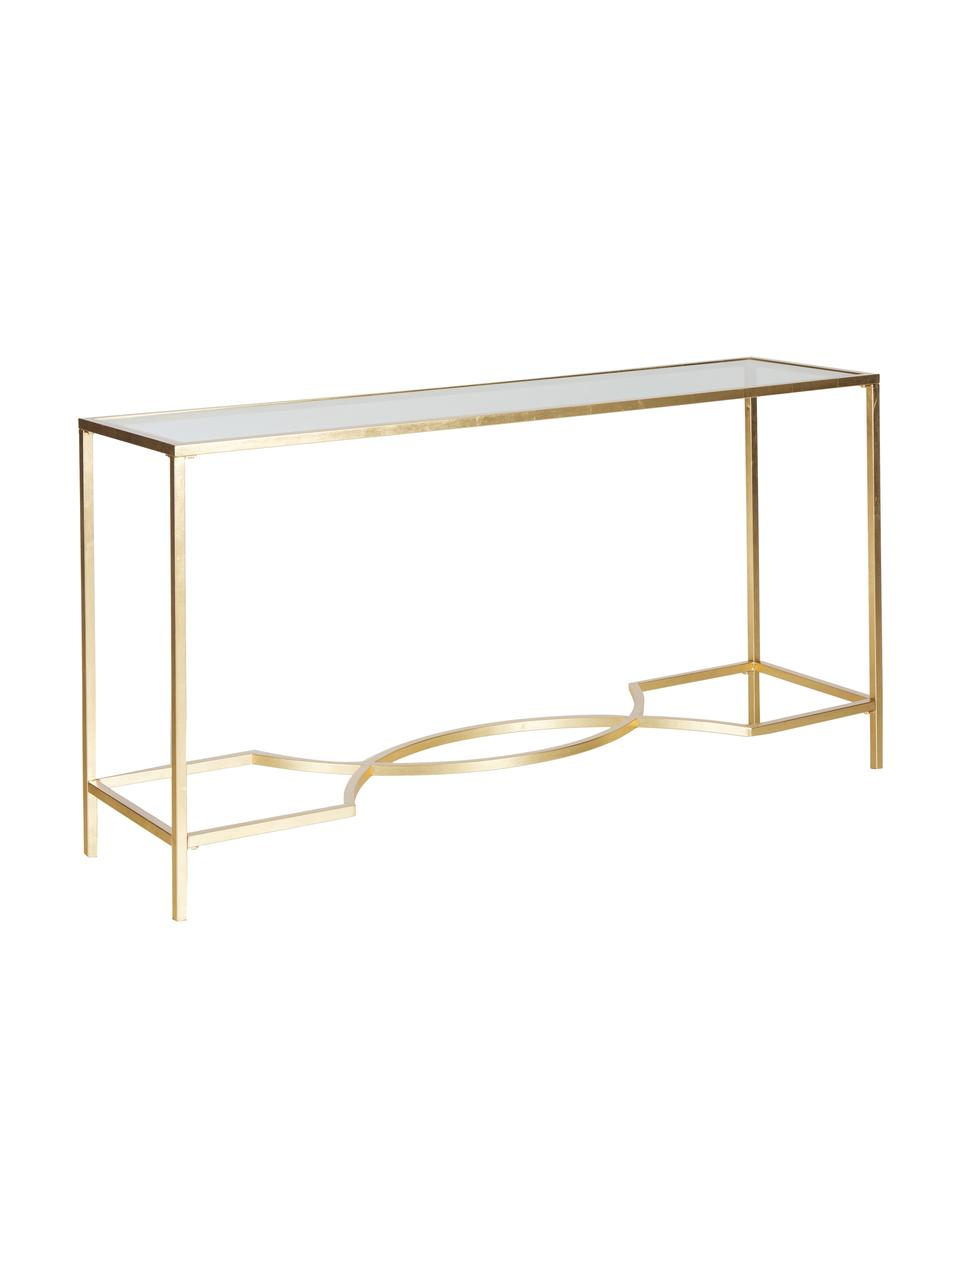 Sidetable Sia met glasplaat, Frame: gelakt metaal, Tafelblad: glas,gehard, Frame: gouden plaat: transparant, B 160 x D 40 cm